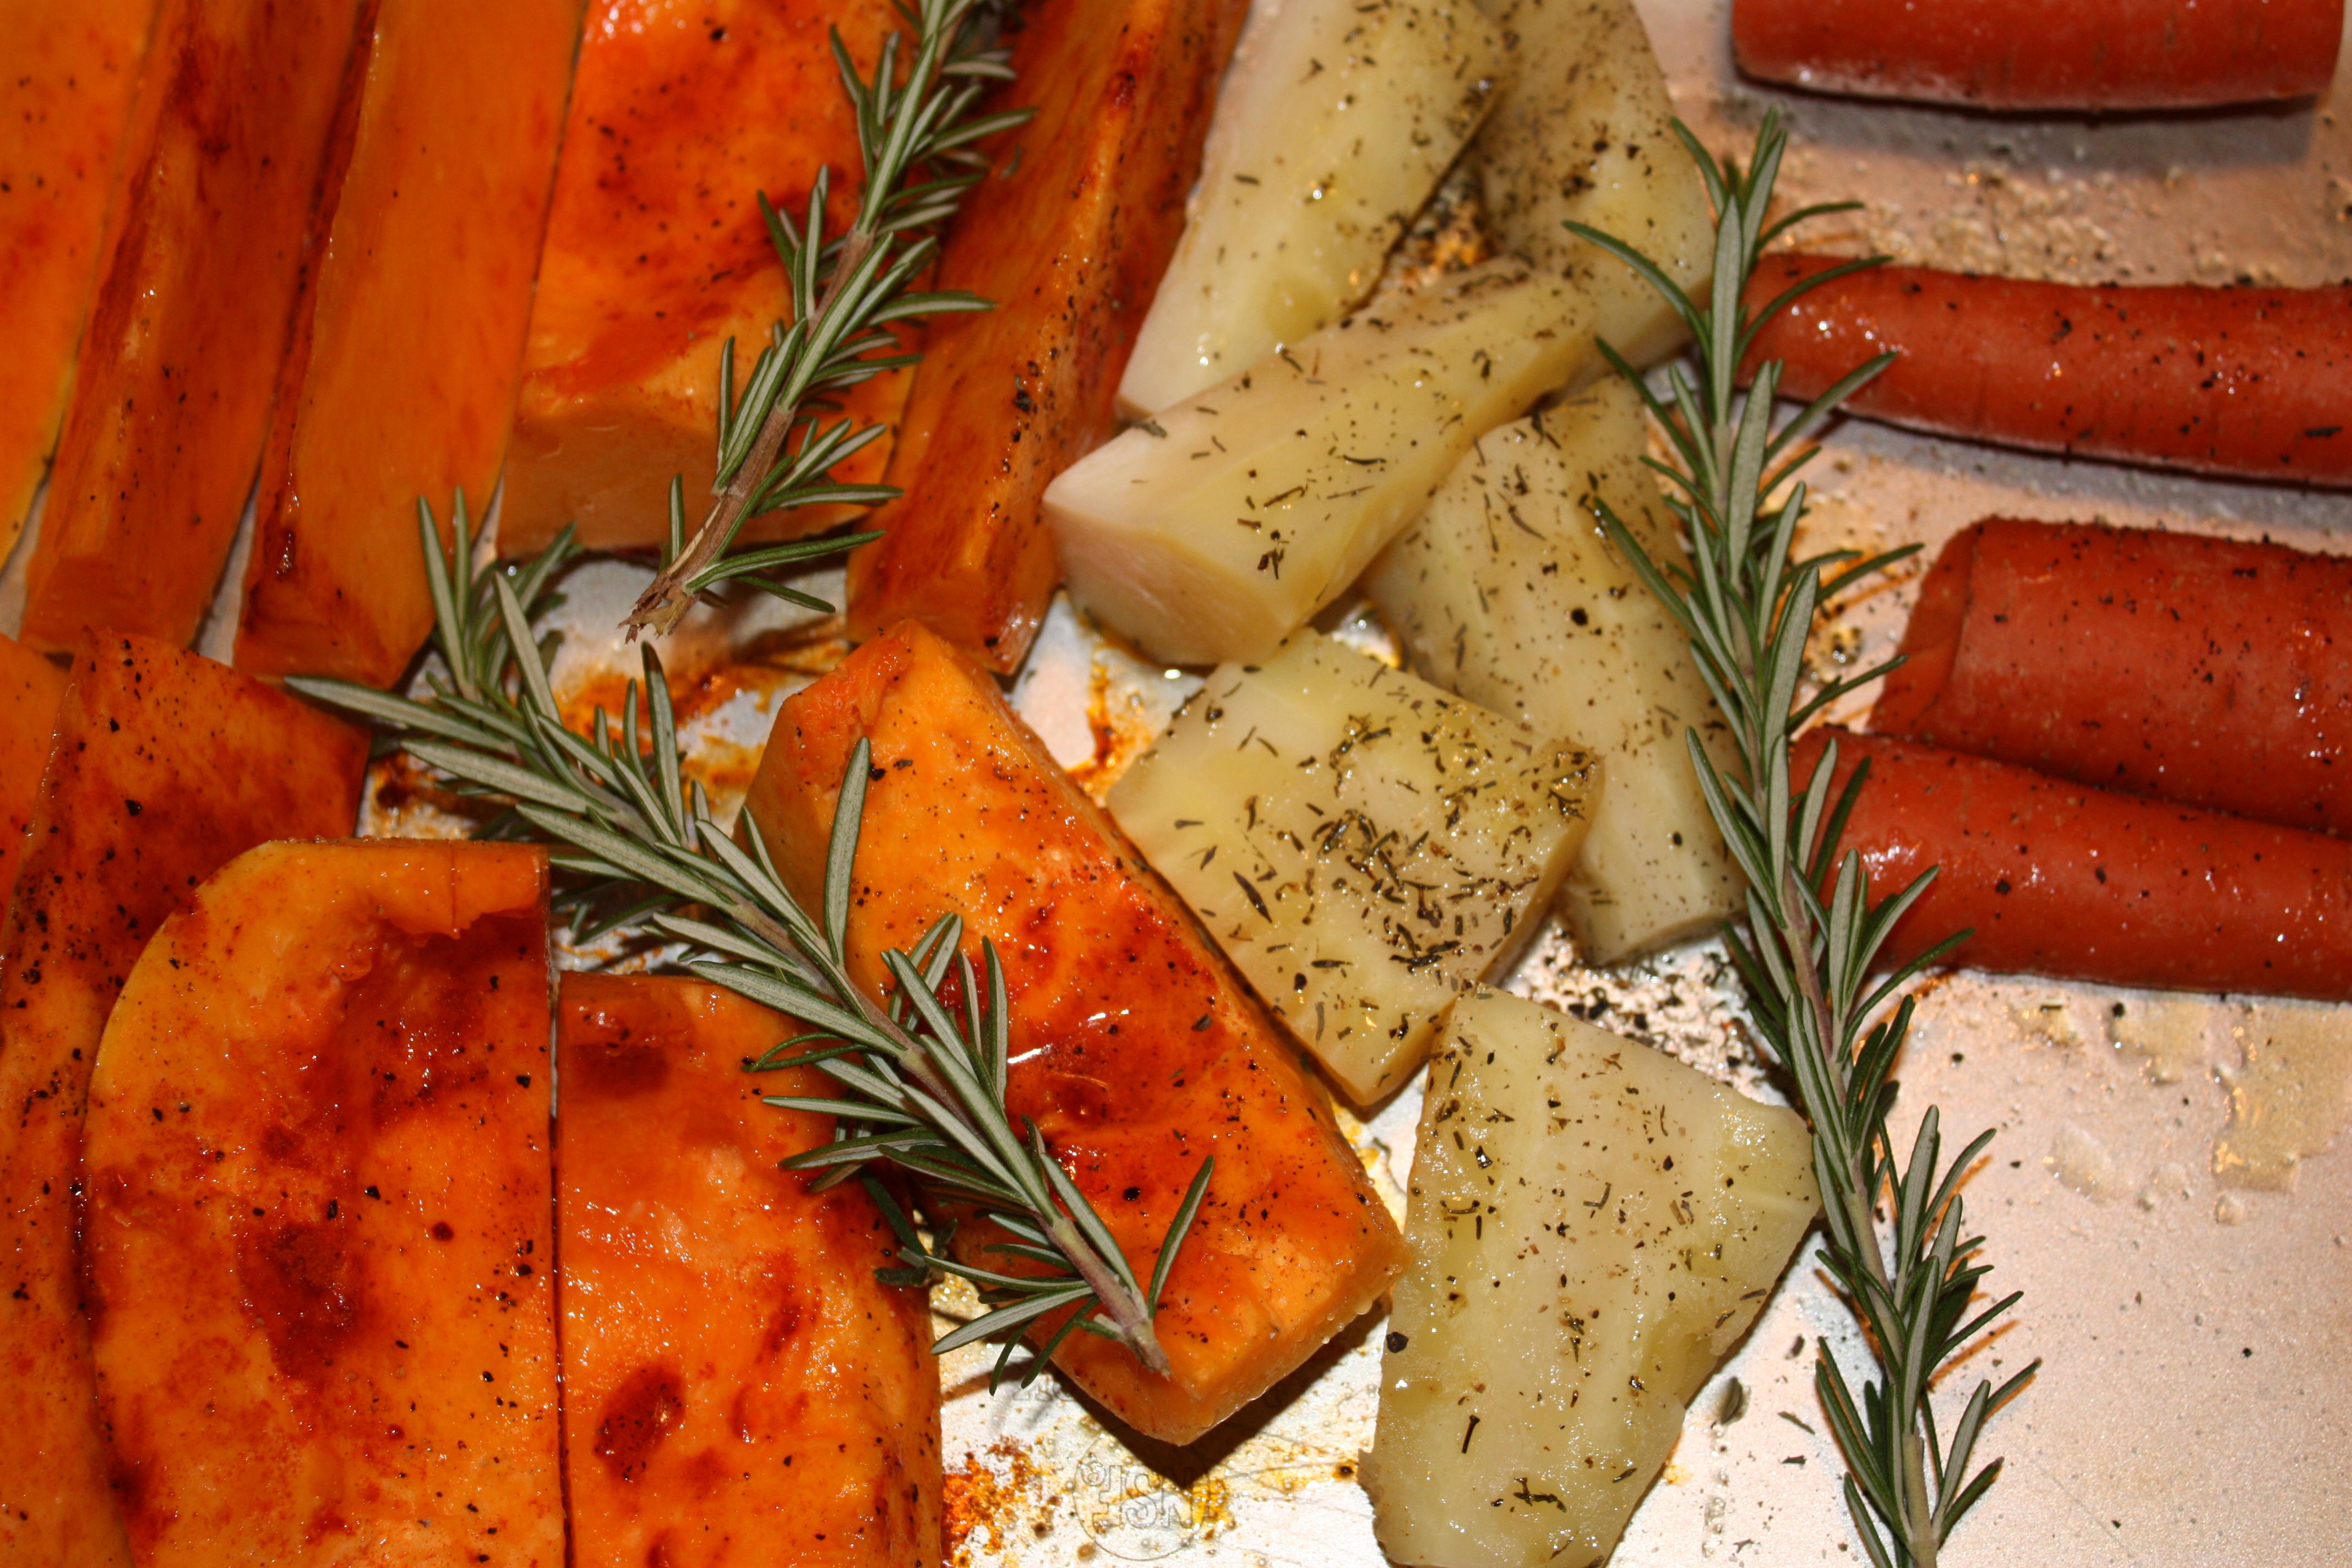 Roast Potatoes, Parsnips and Butternut Squash